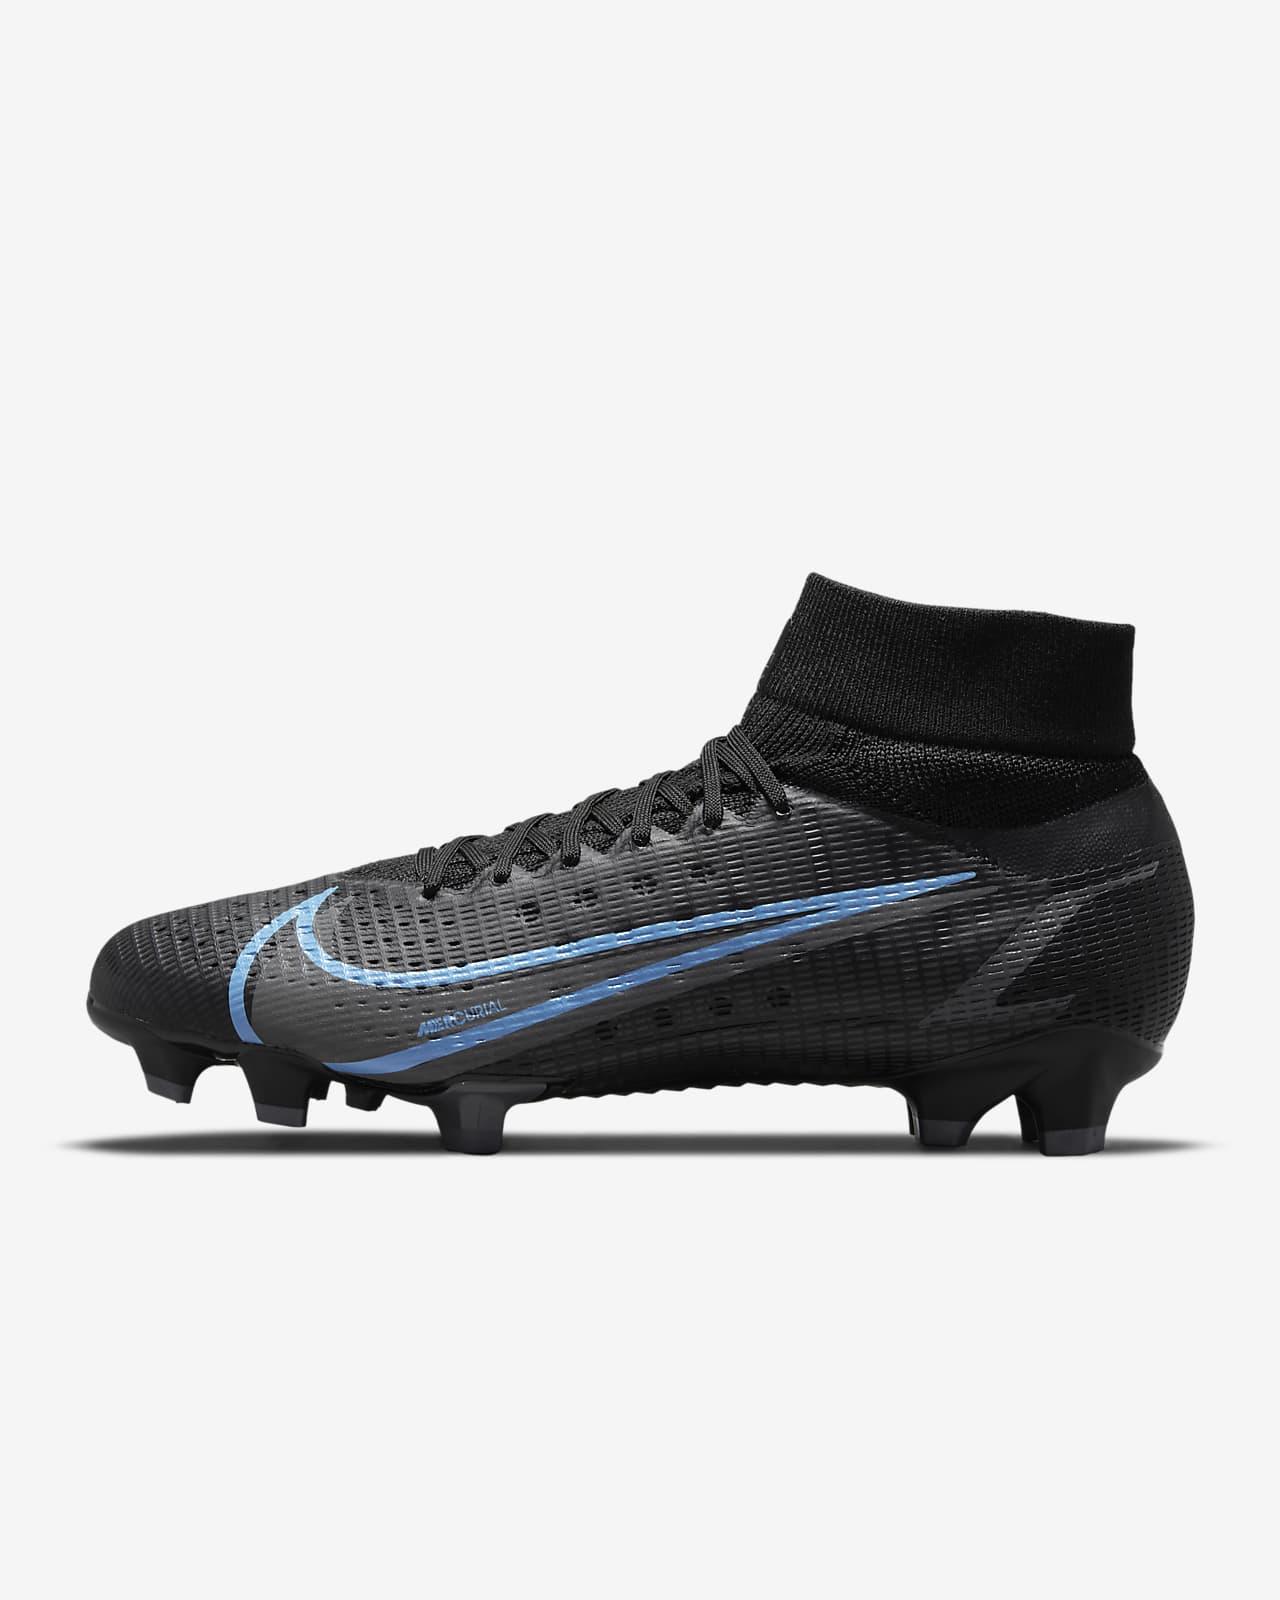 Calzado de fútbol para terreno firme Nike Mercurial Superfly 8 Pro FG